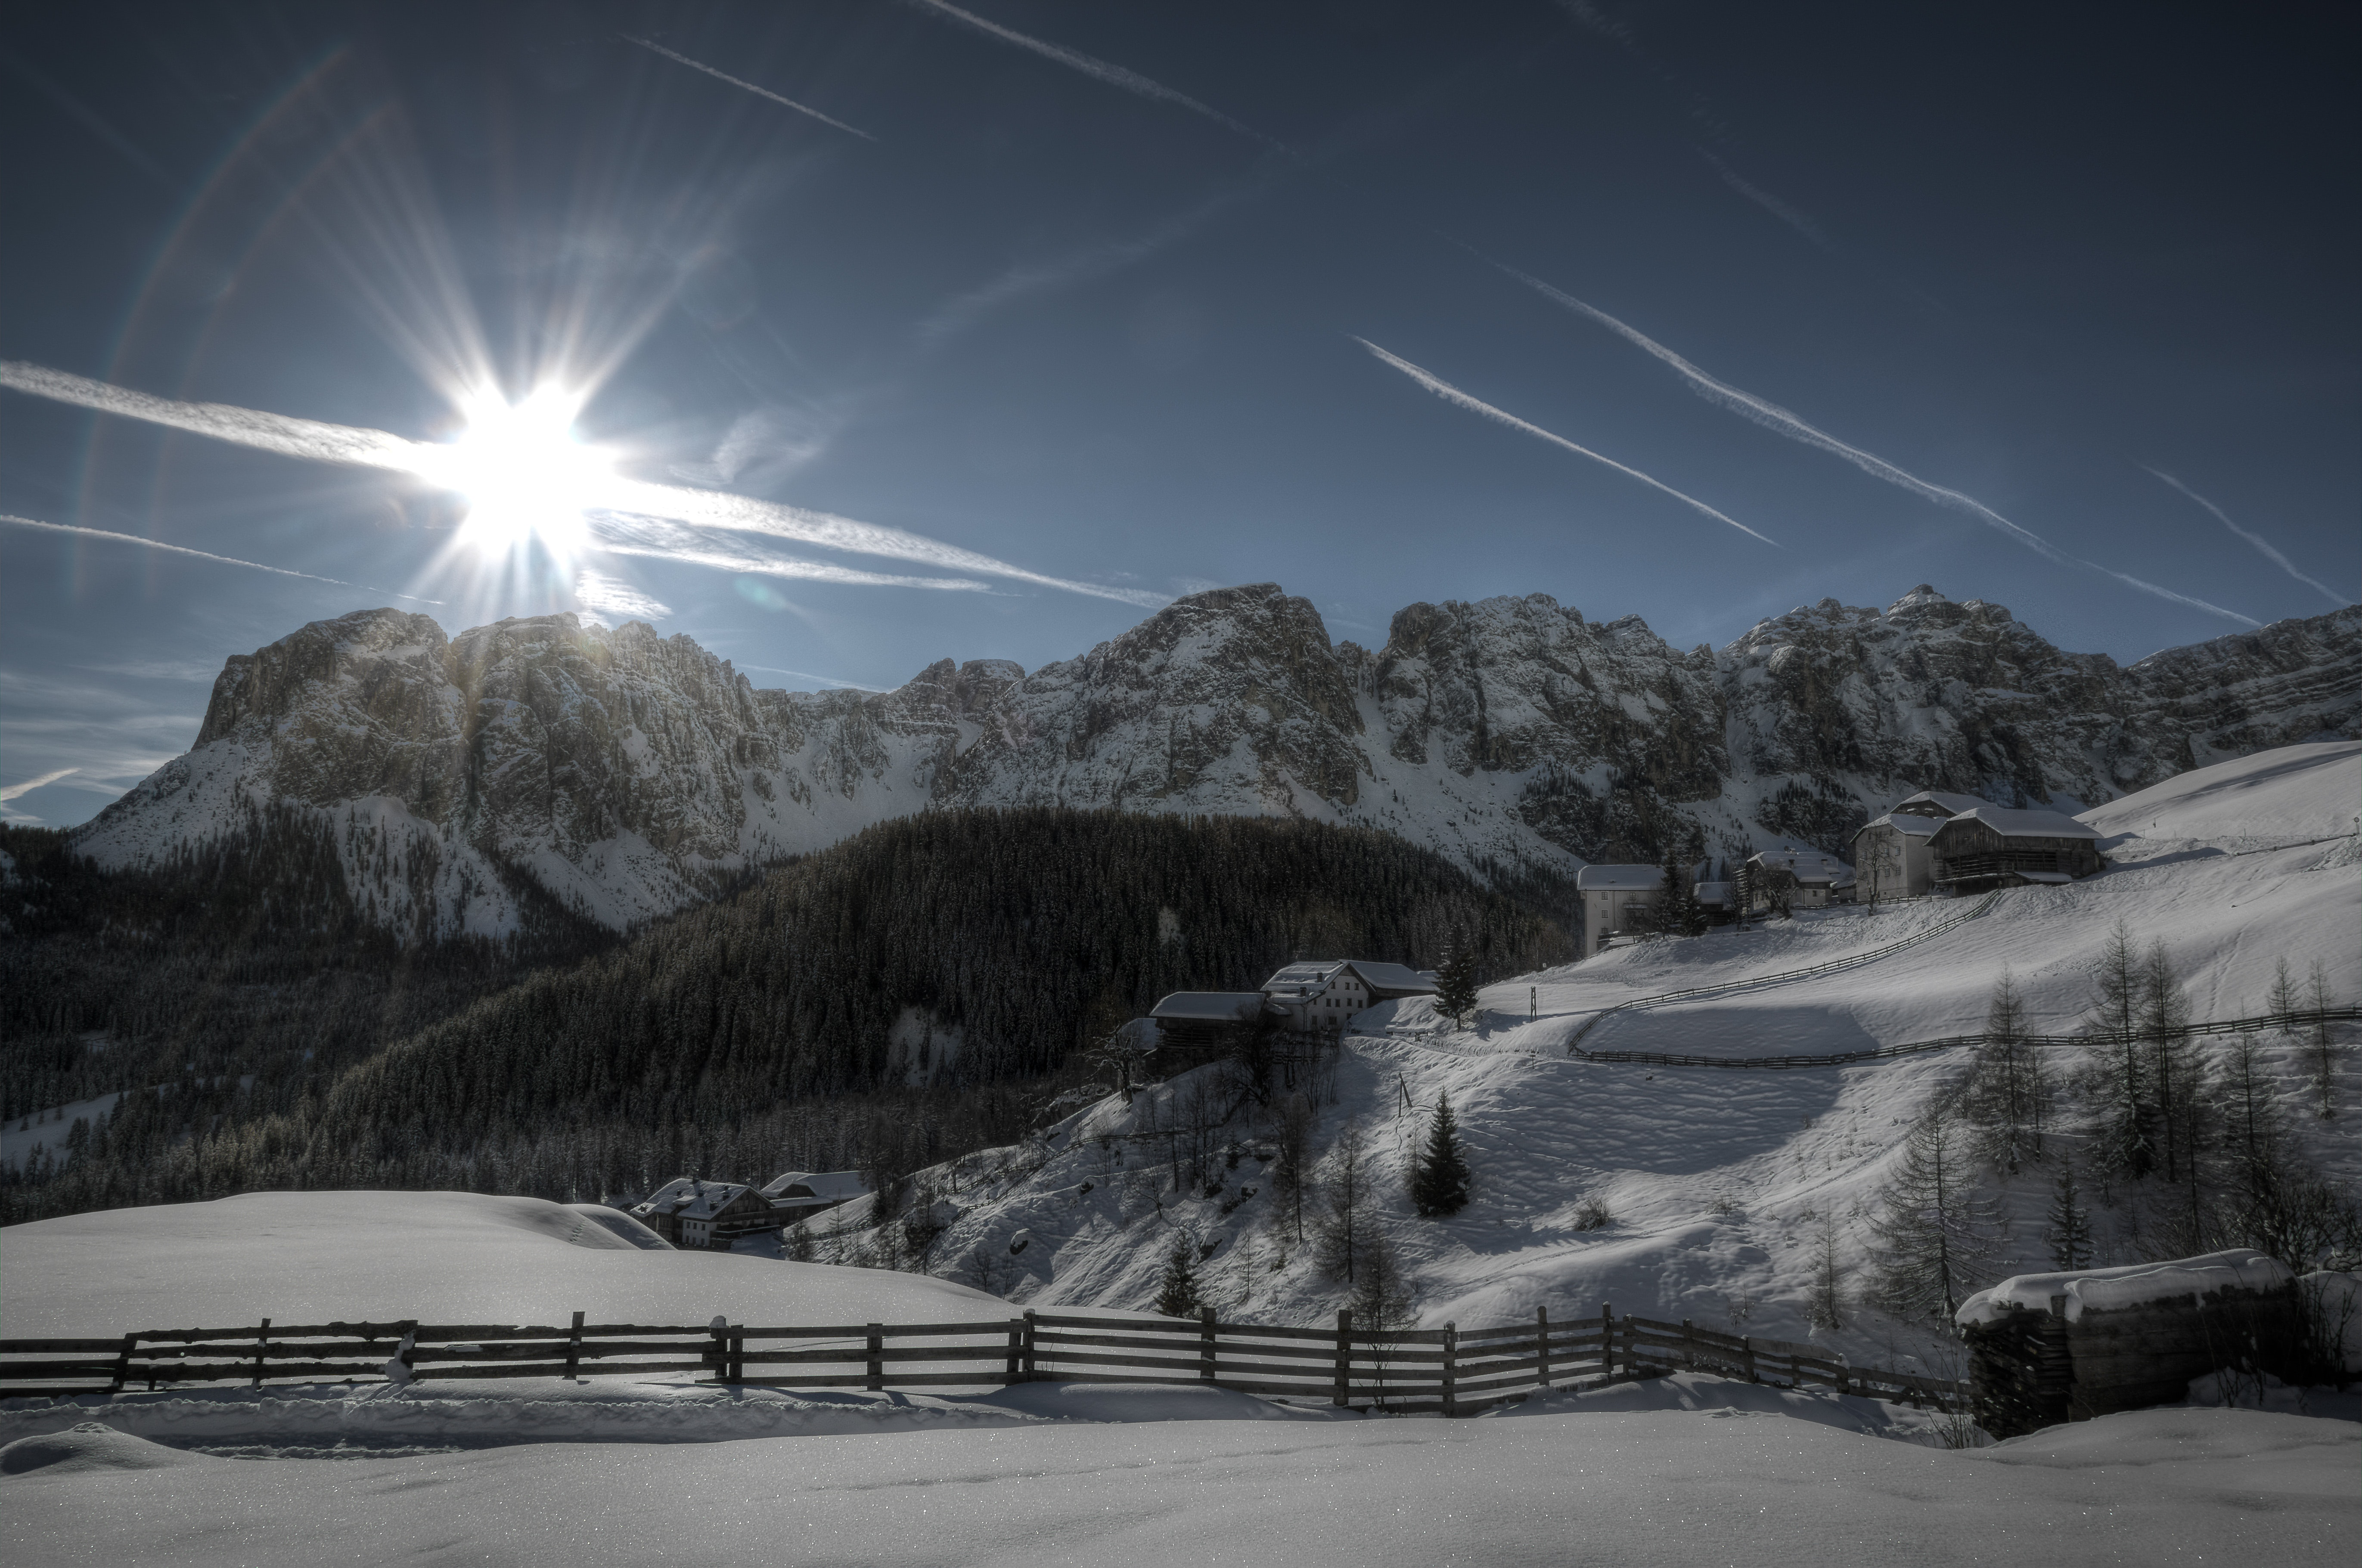 Snow covered mountain illustration photo